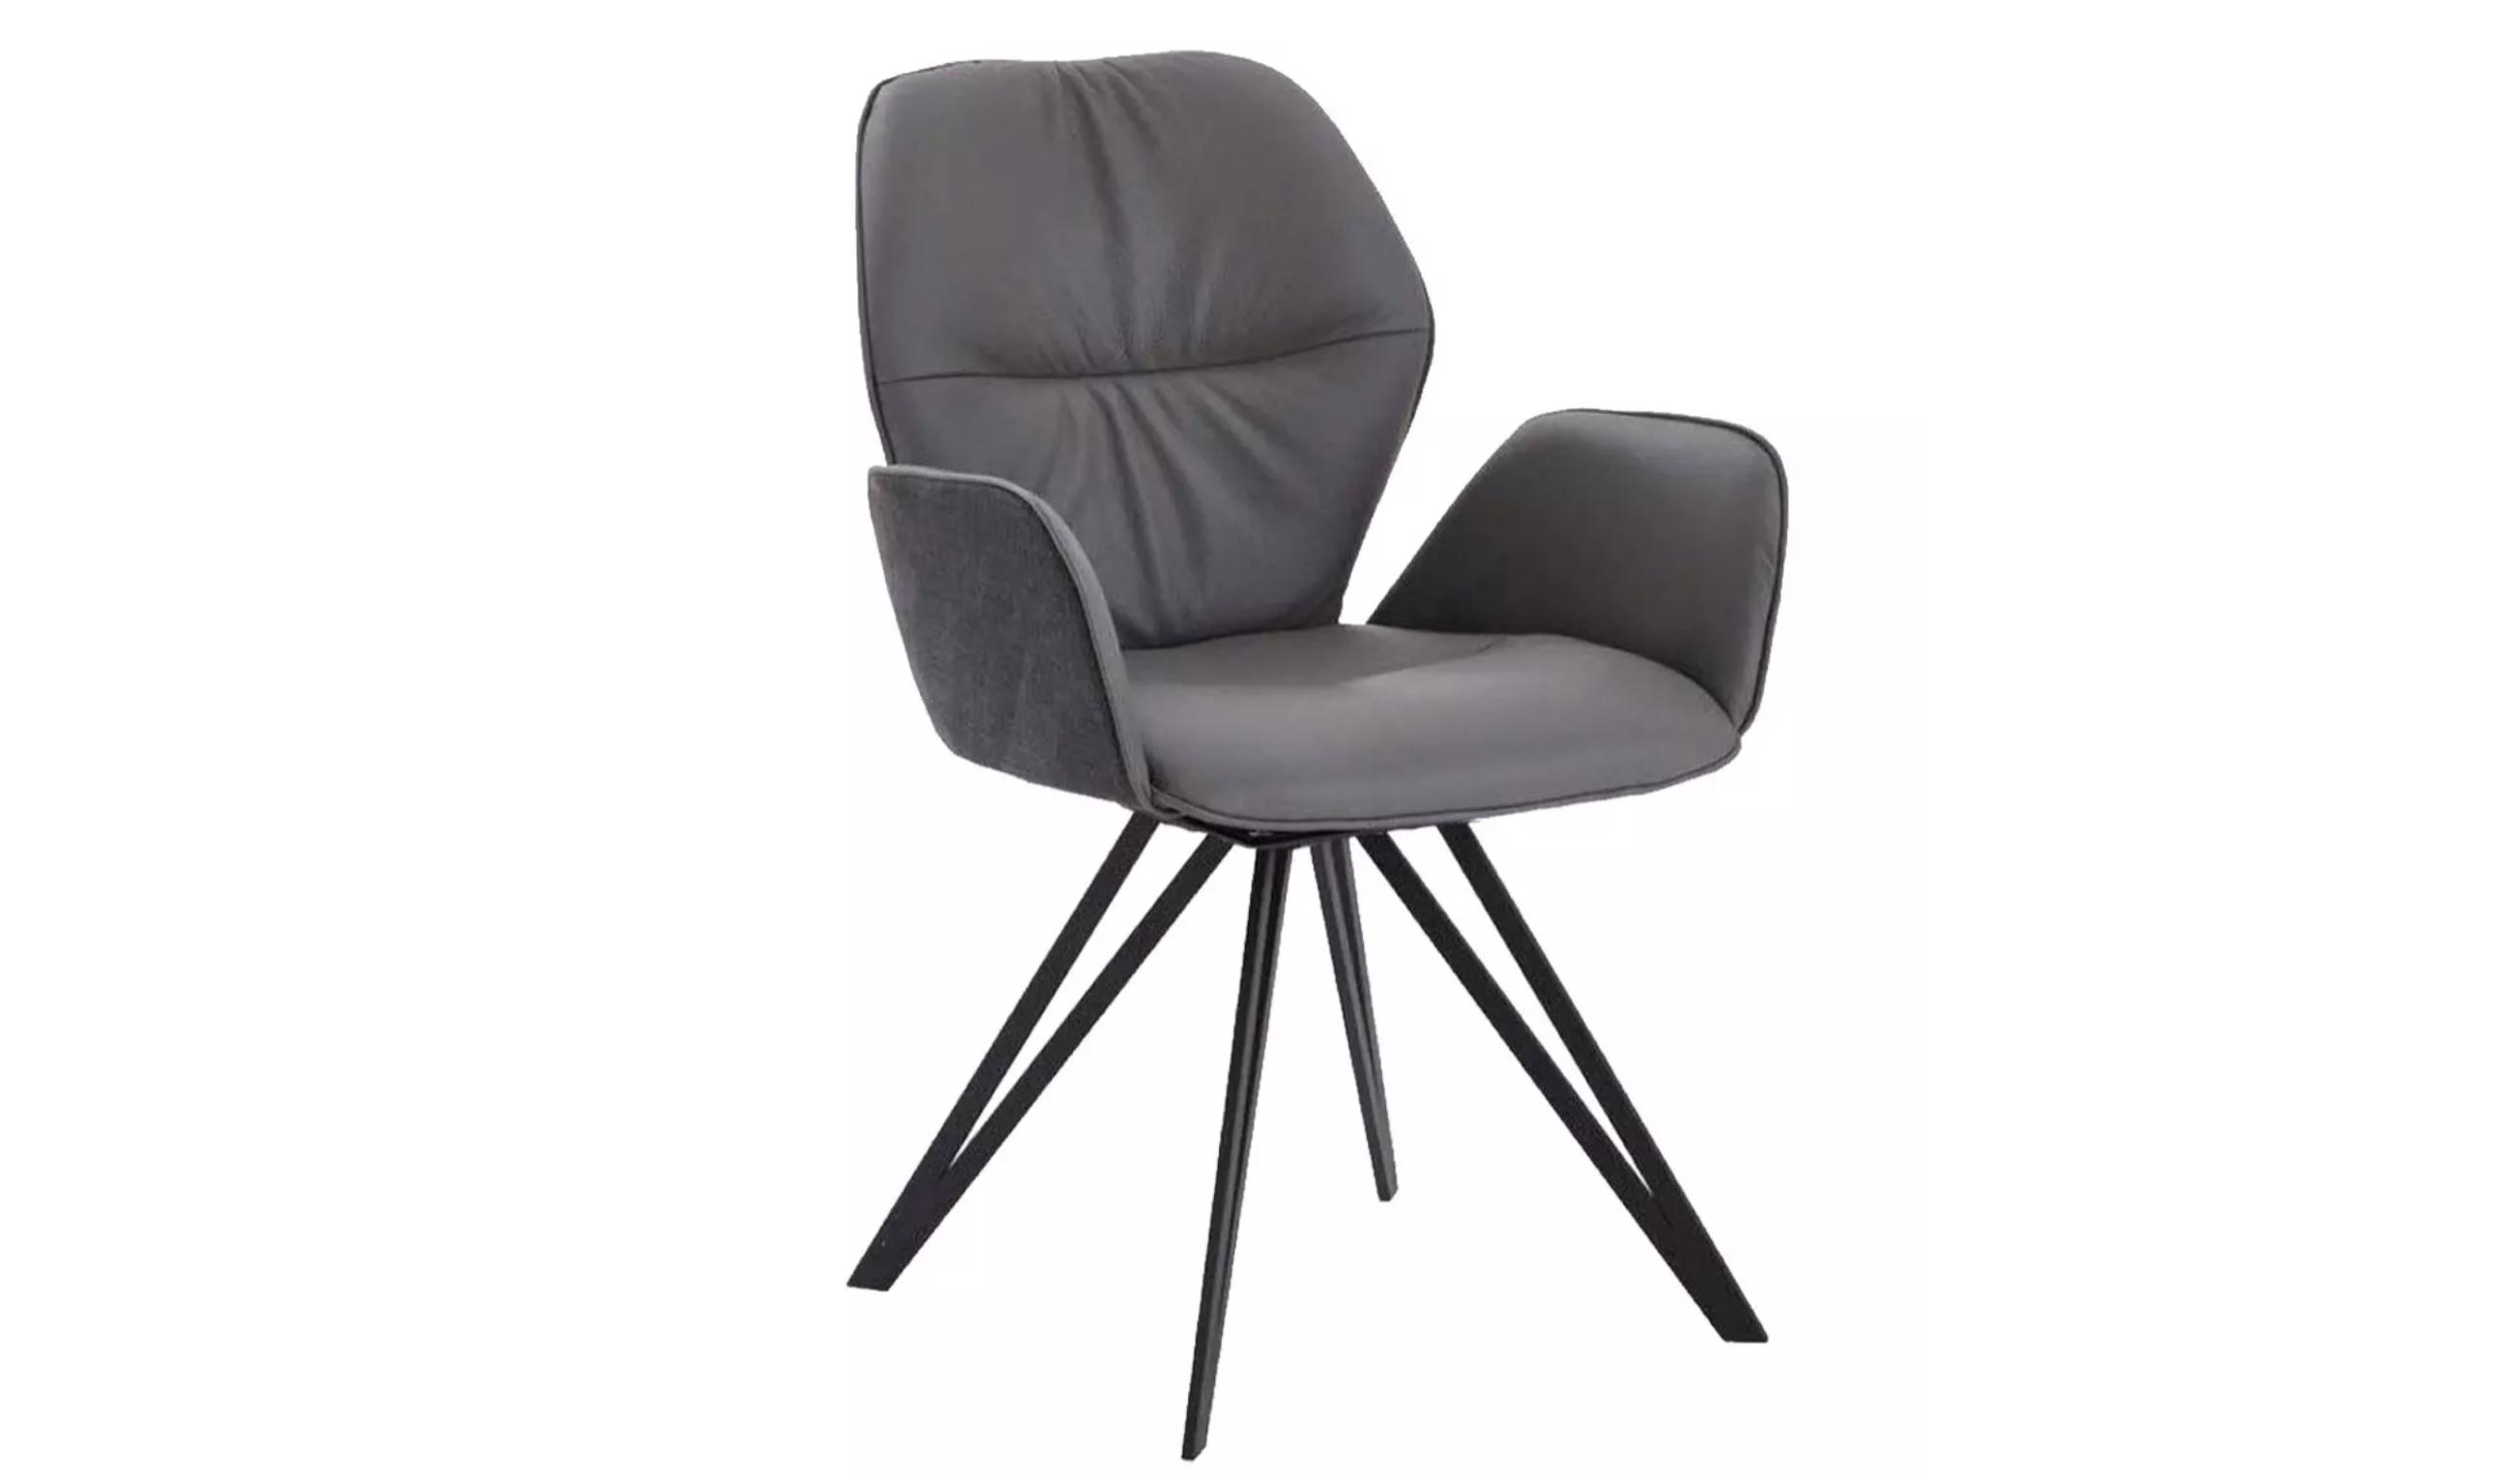 Design-Stuhl Chianti 03